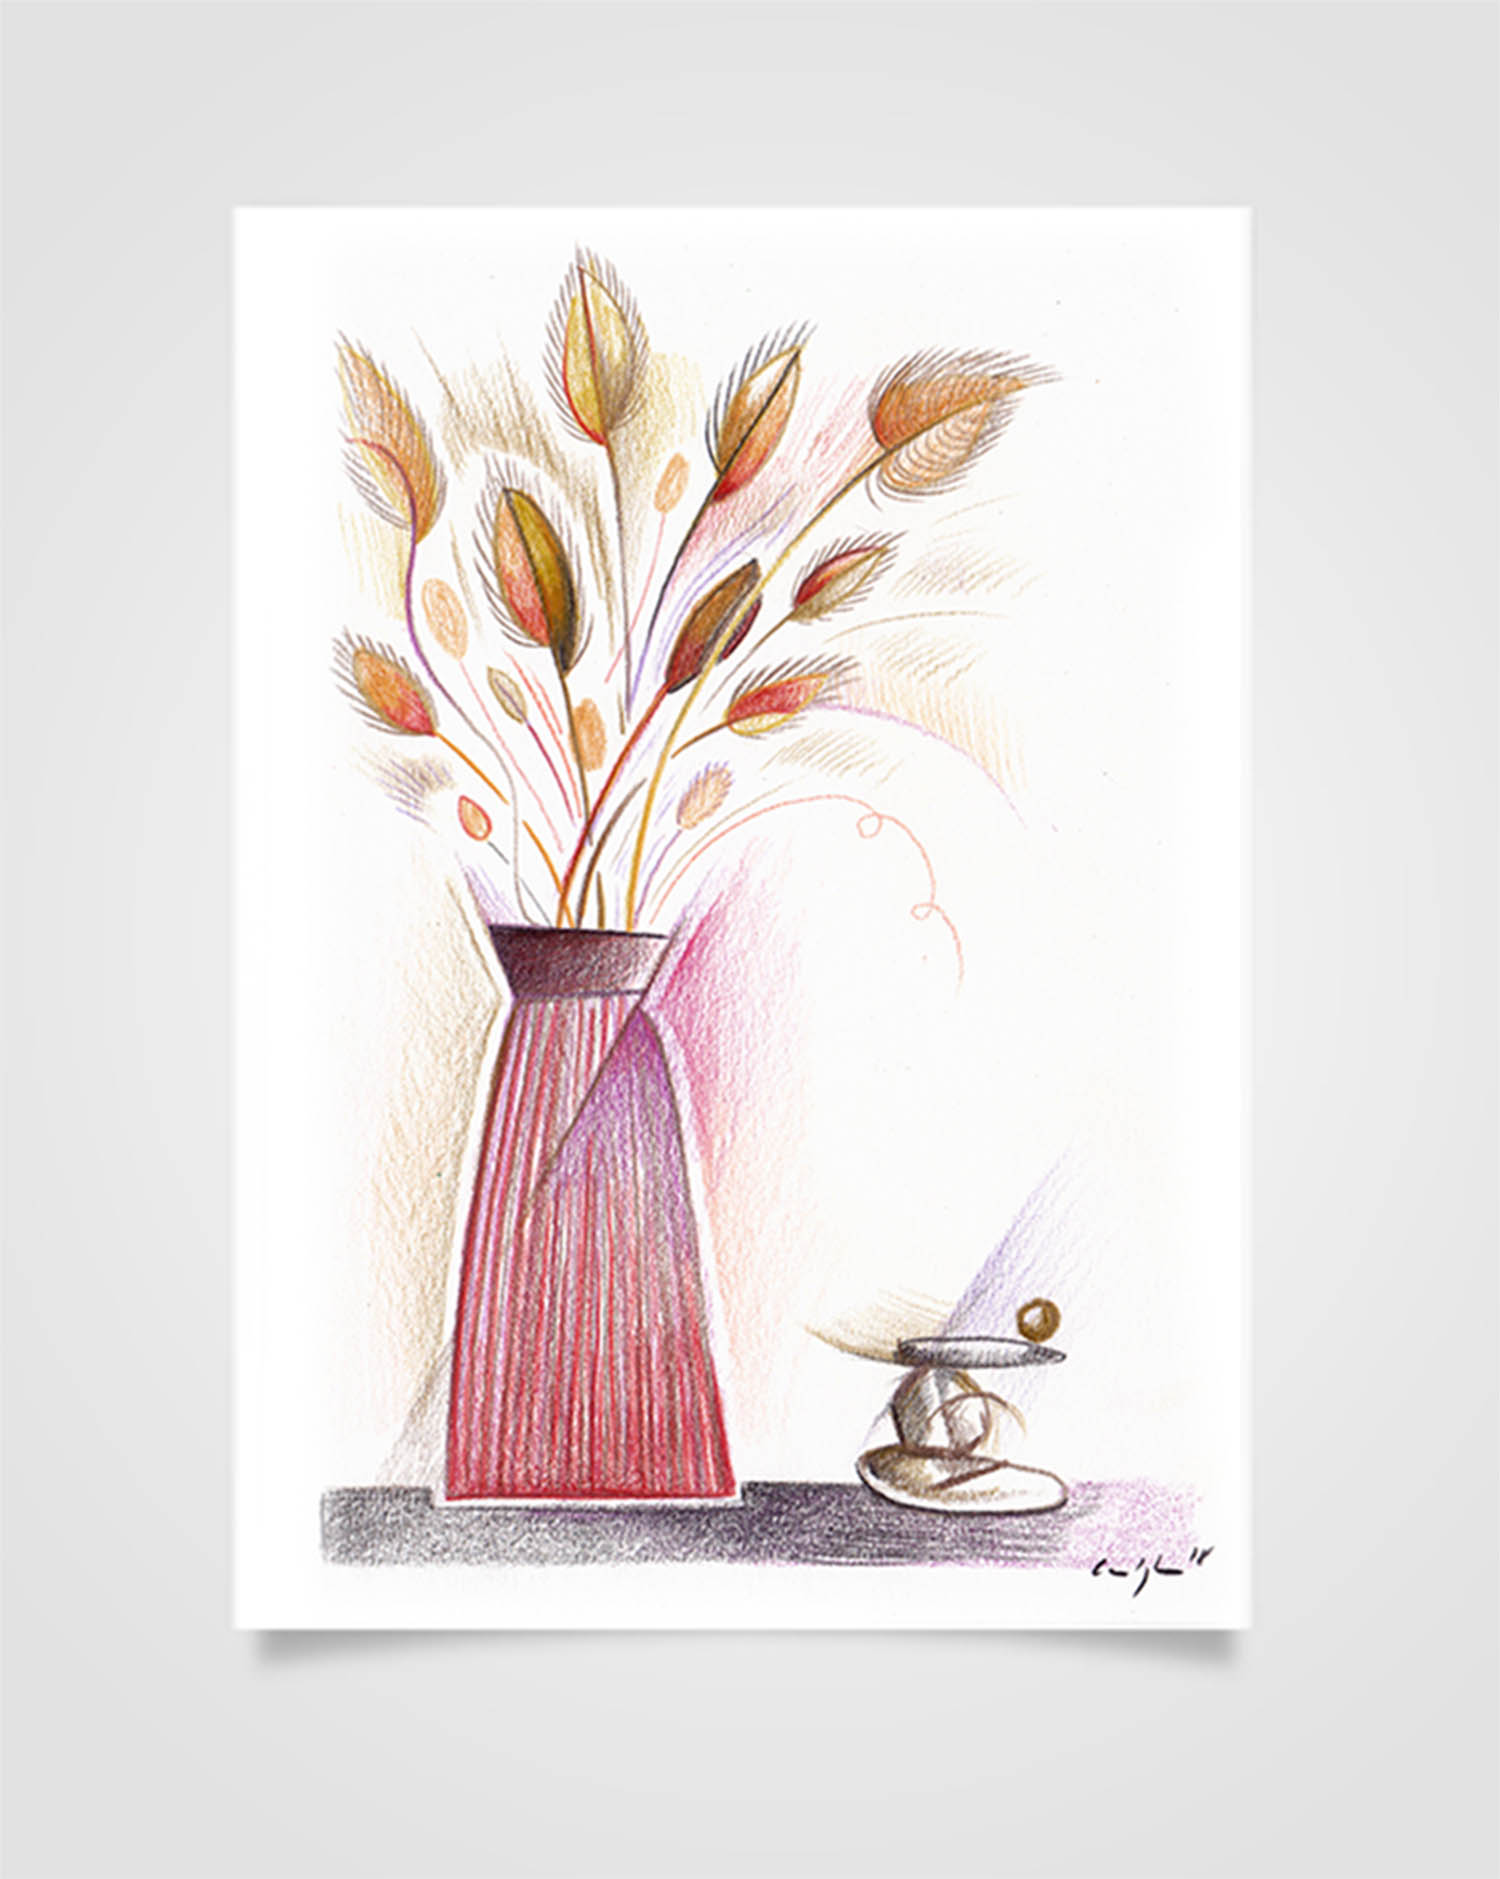 """Flora - Fiori secchi"" Pastelli su carta, 14,8 x 21cm"